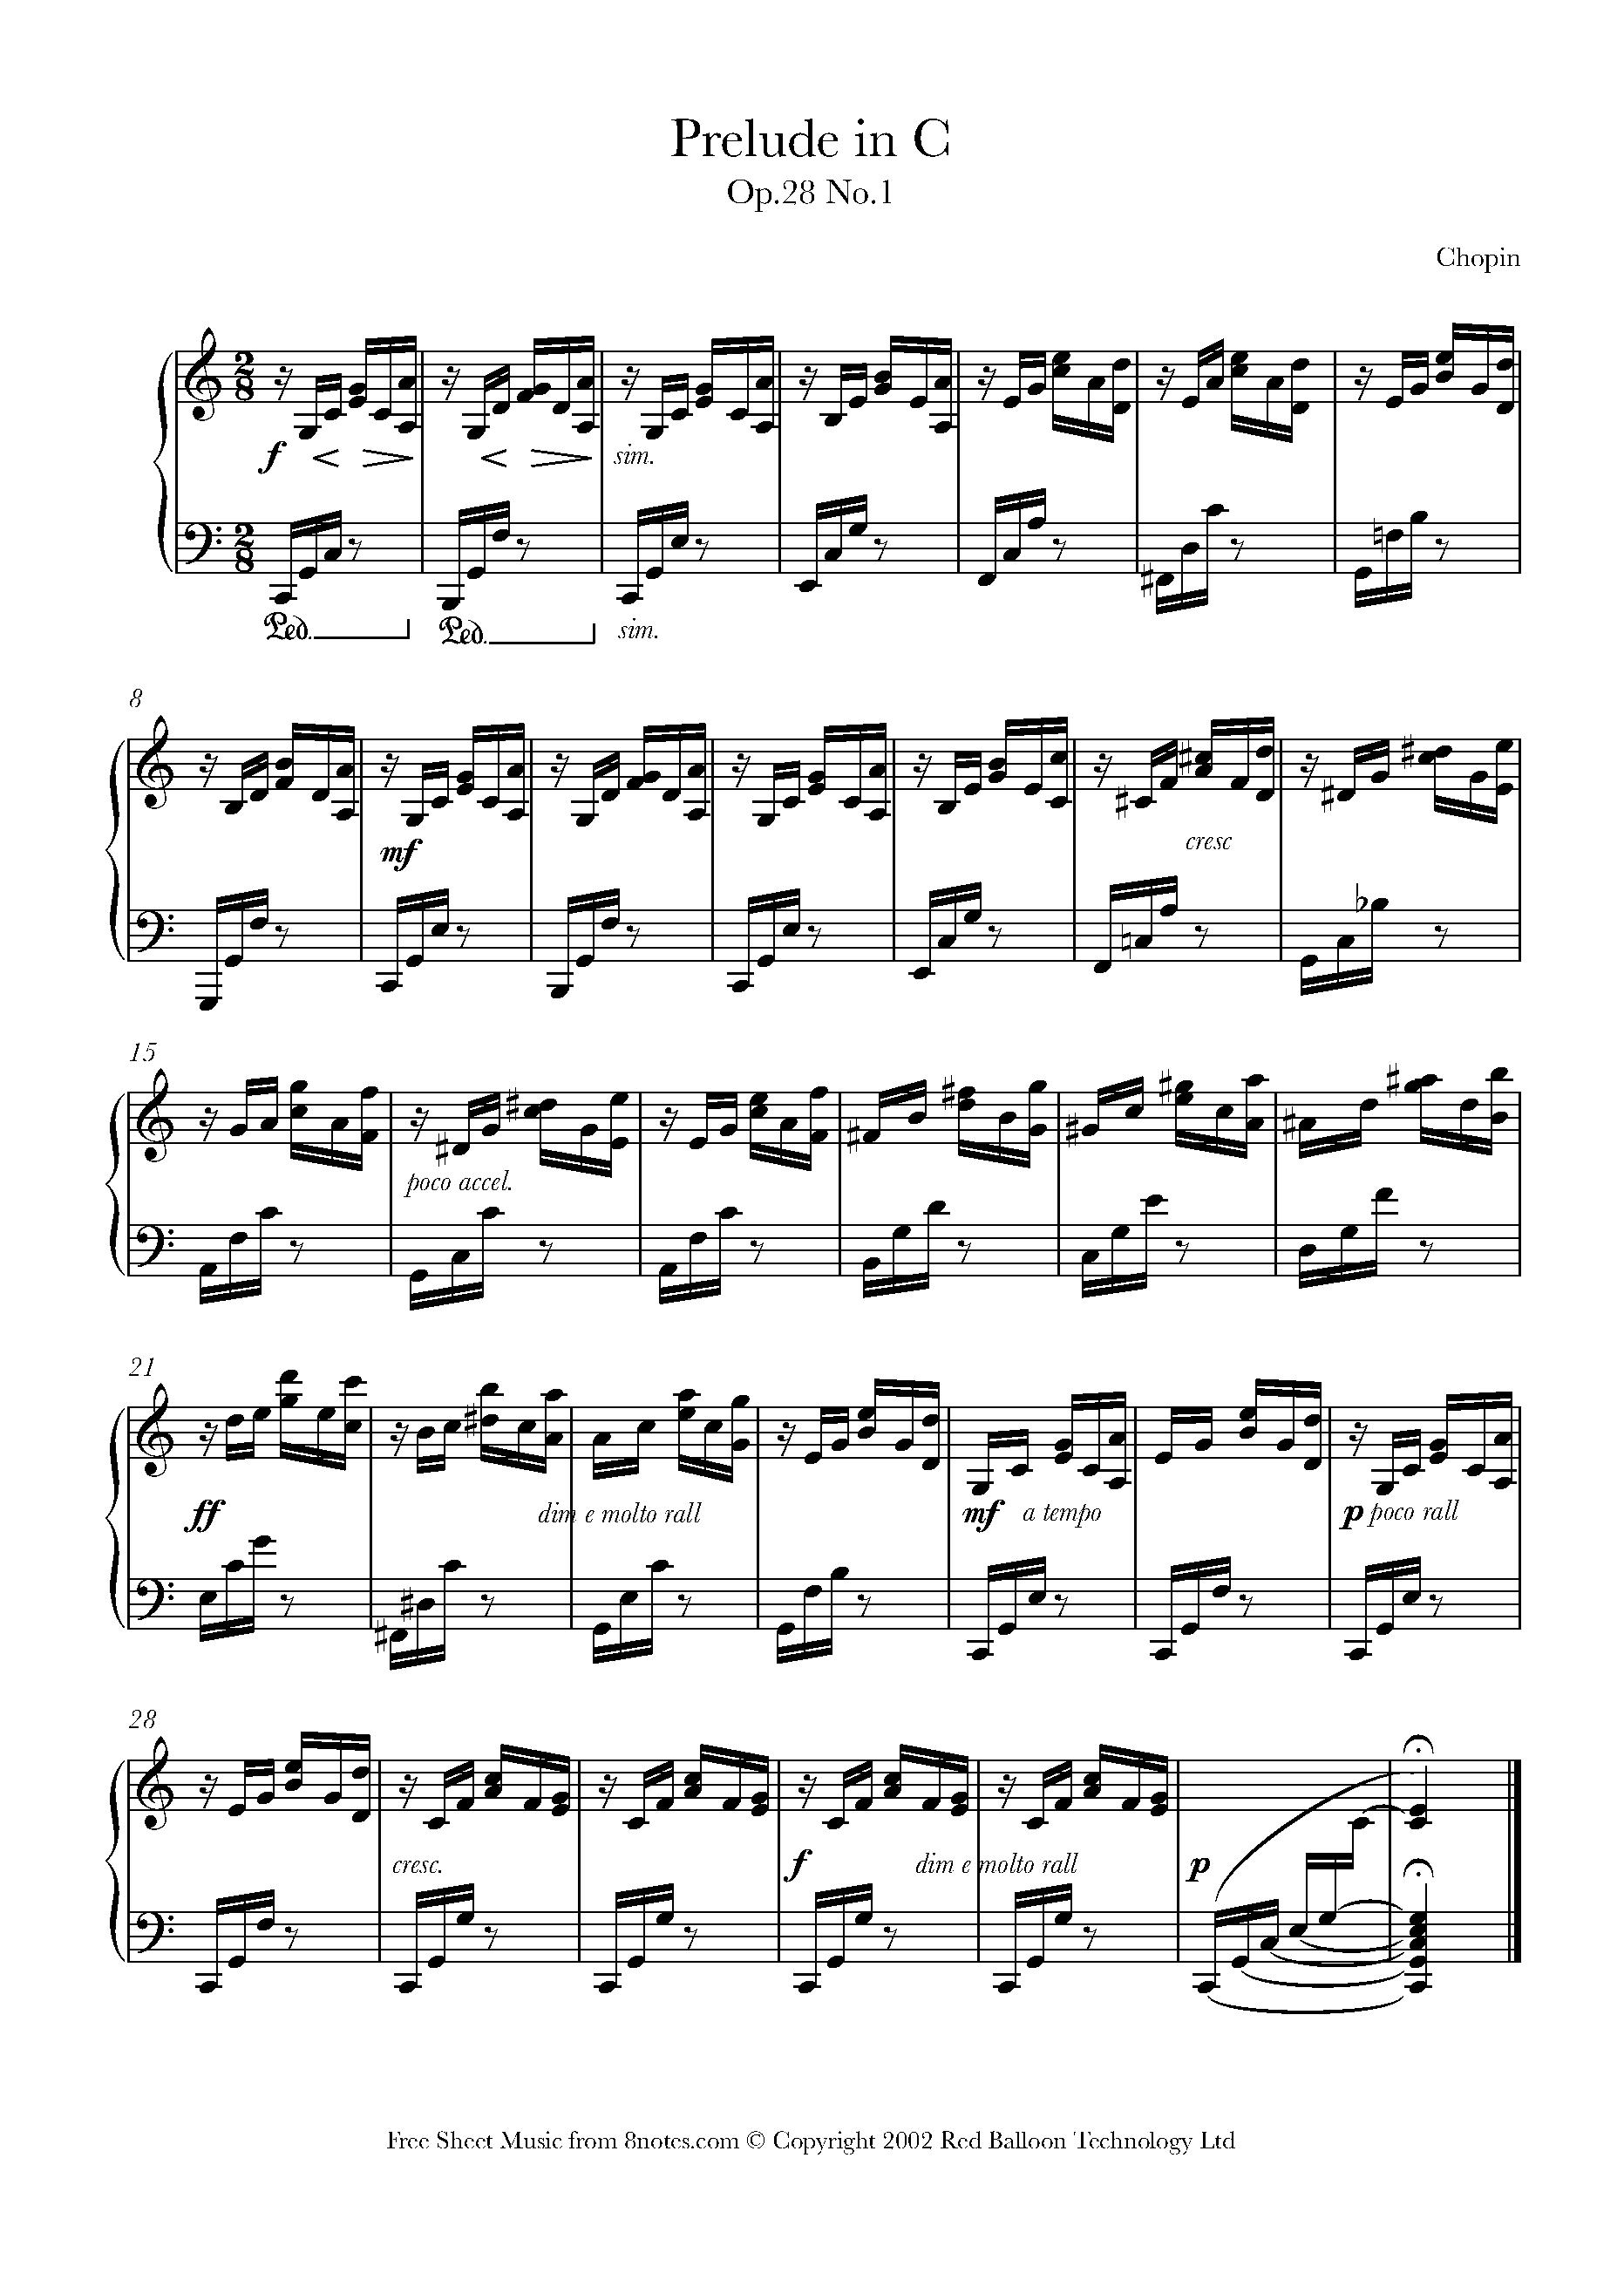 Chopin - Prelude in C Op 28 No 1 sheet music for Piano